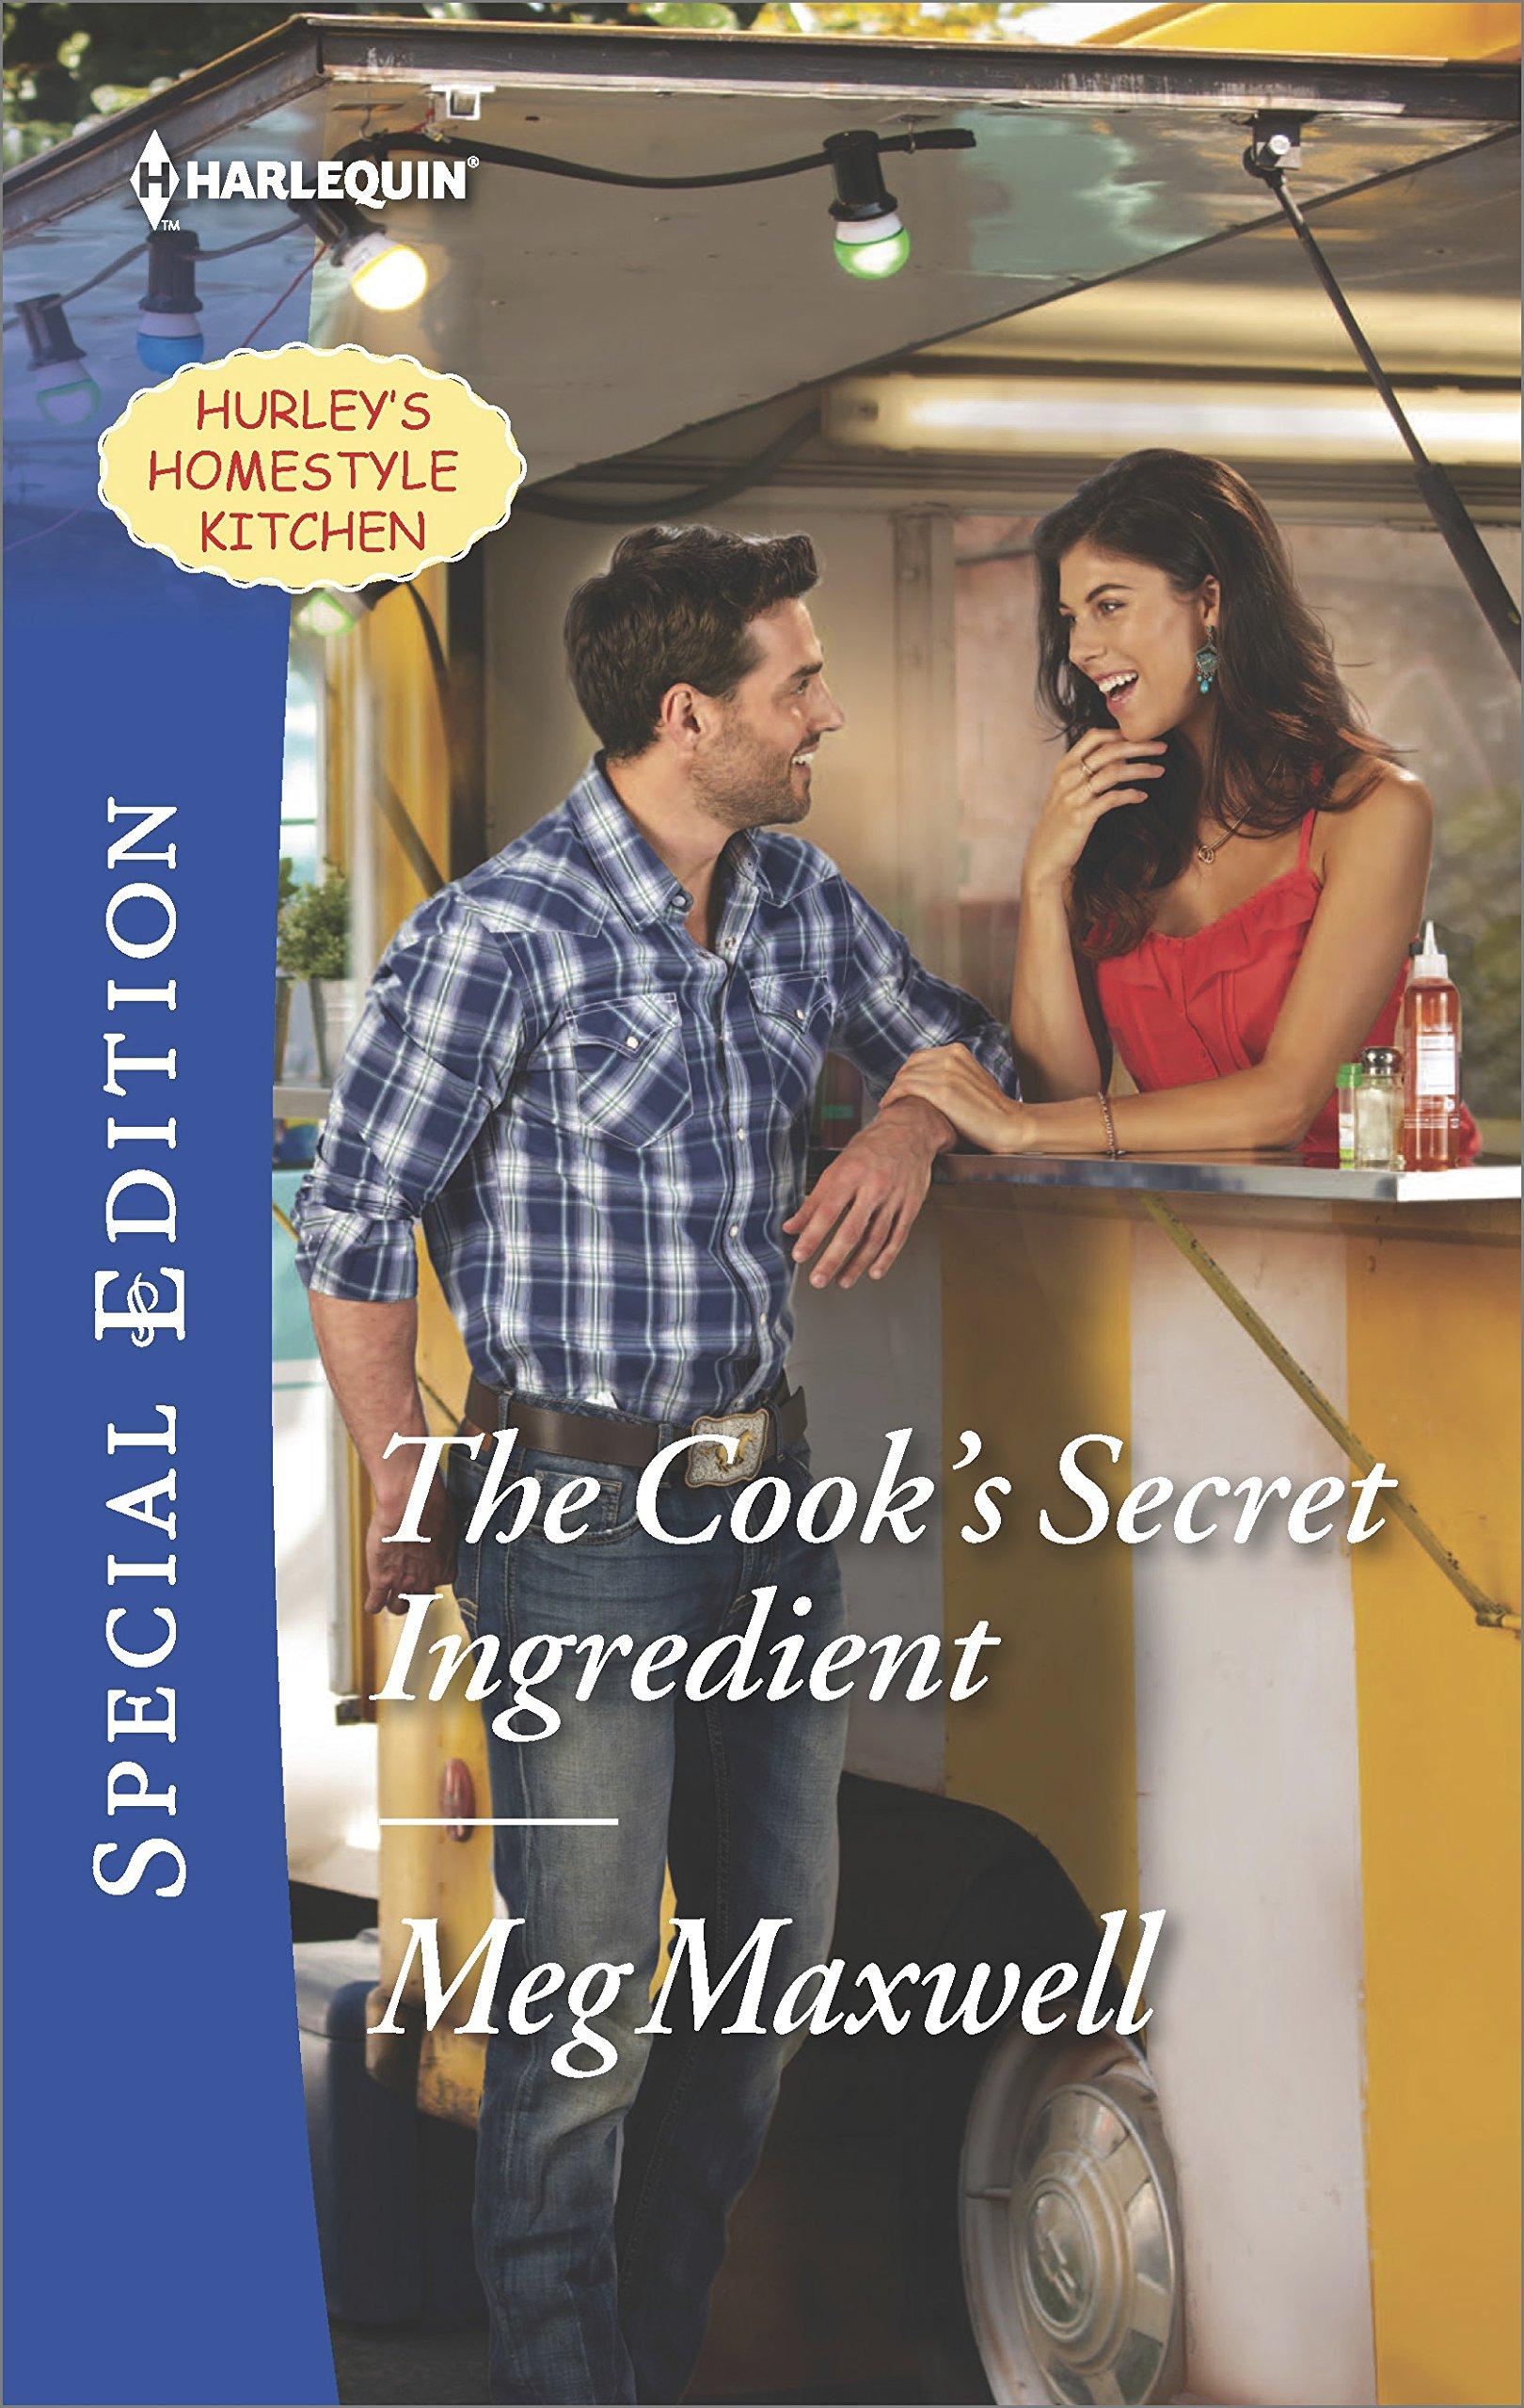 American Homestyle Kitchen The Cooks Secret Ingredient Hurleys Homestyle Kitchen Meg